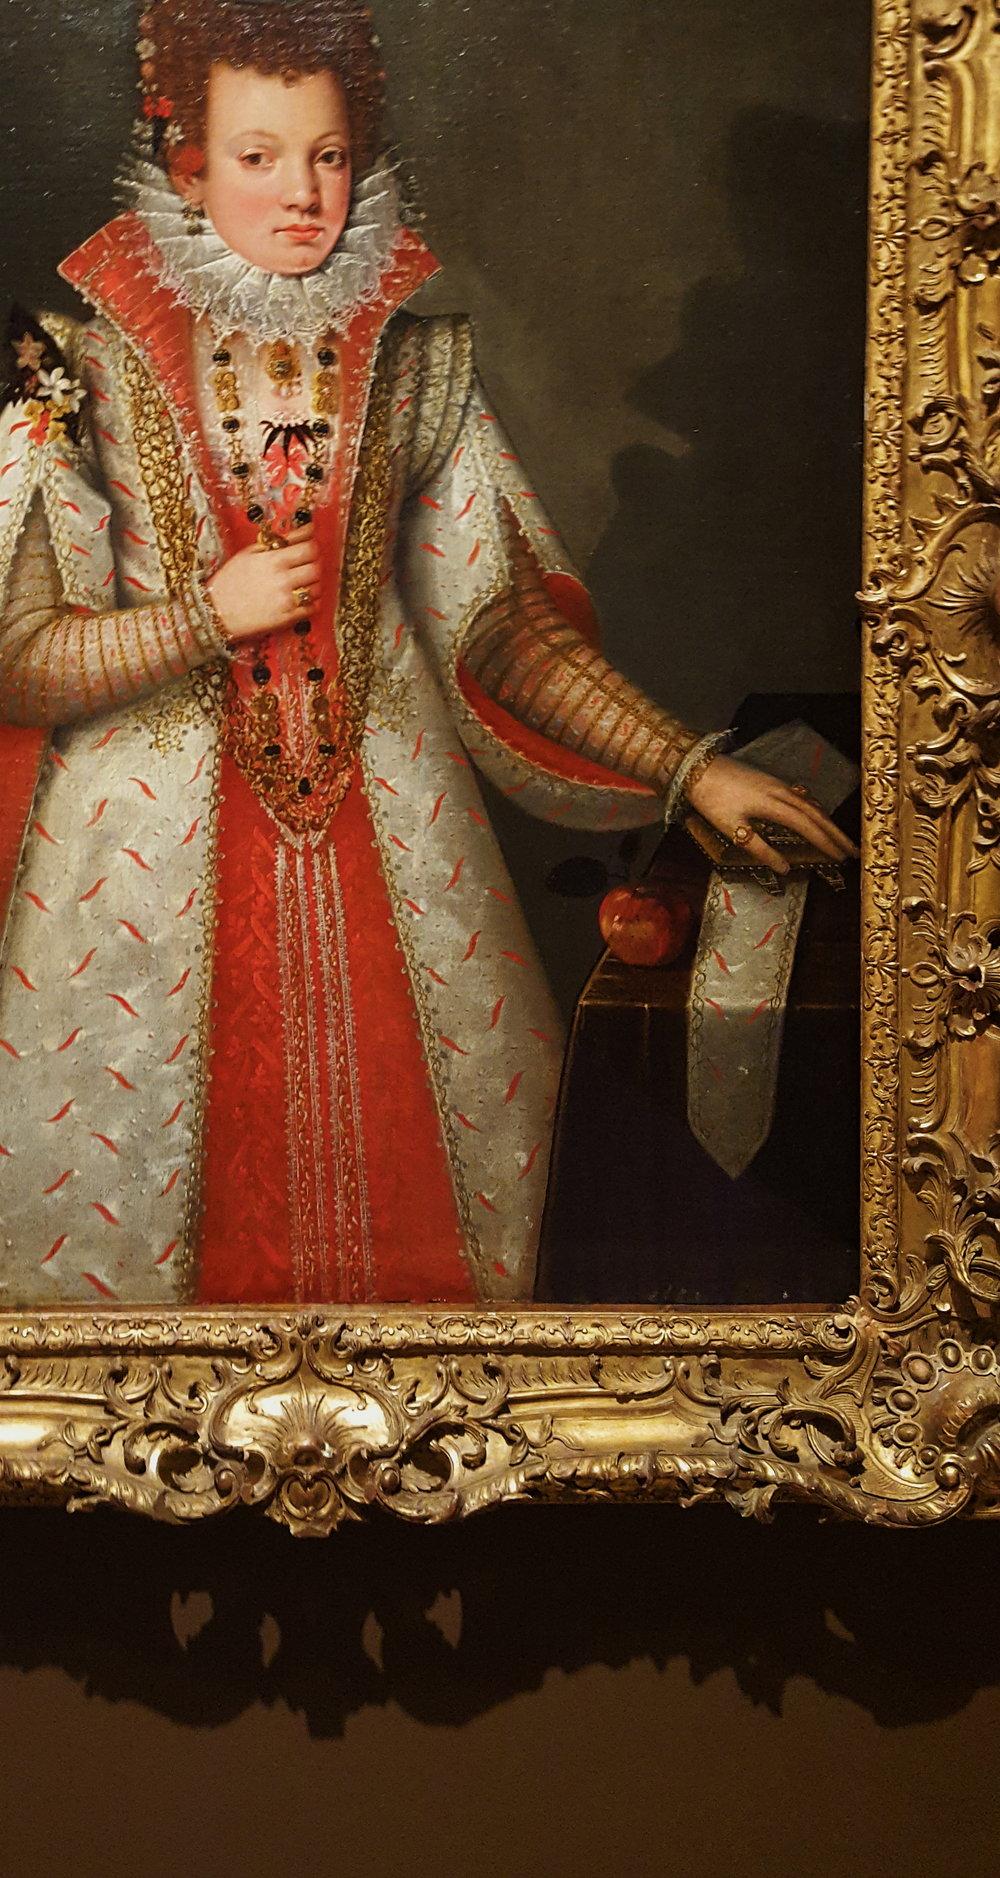 Alonzo Sánchez Coello,  Portrait of a Young Noblewoman,  1593.